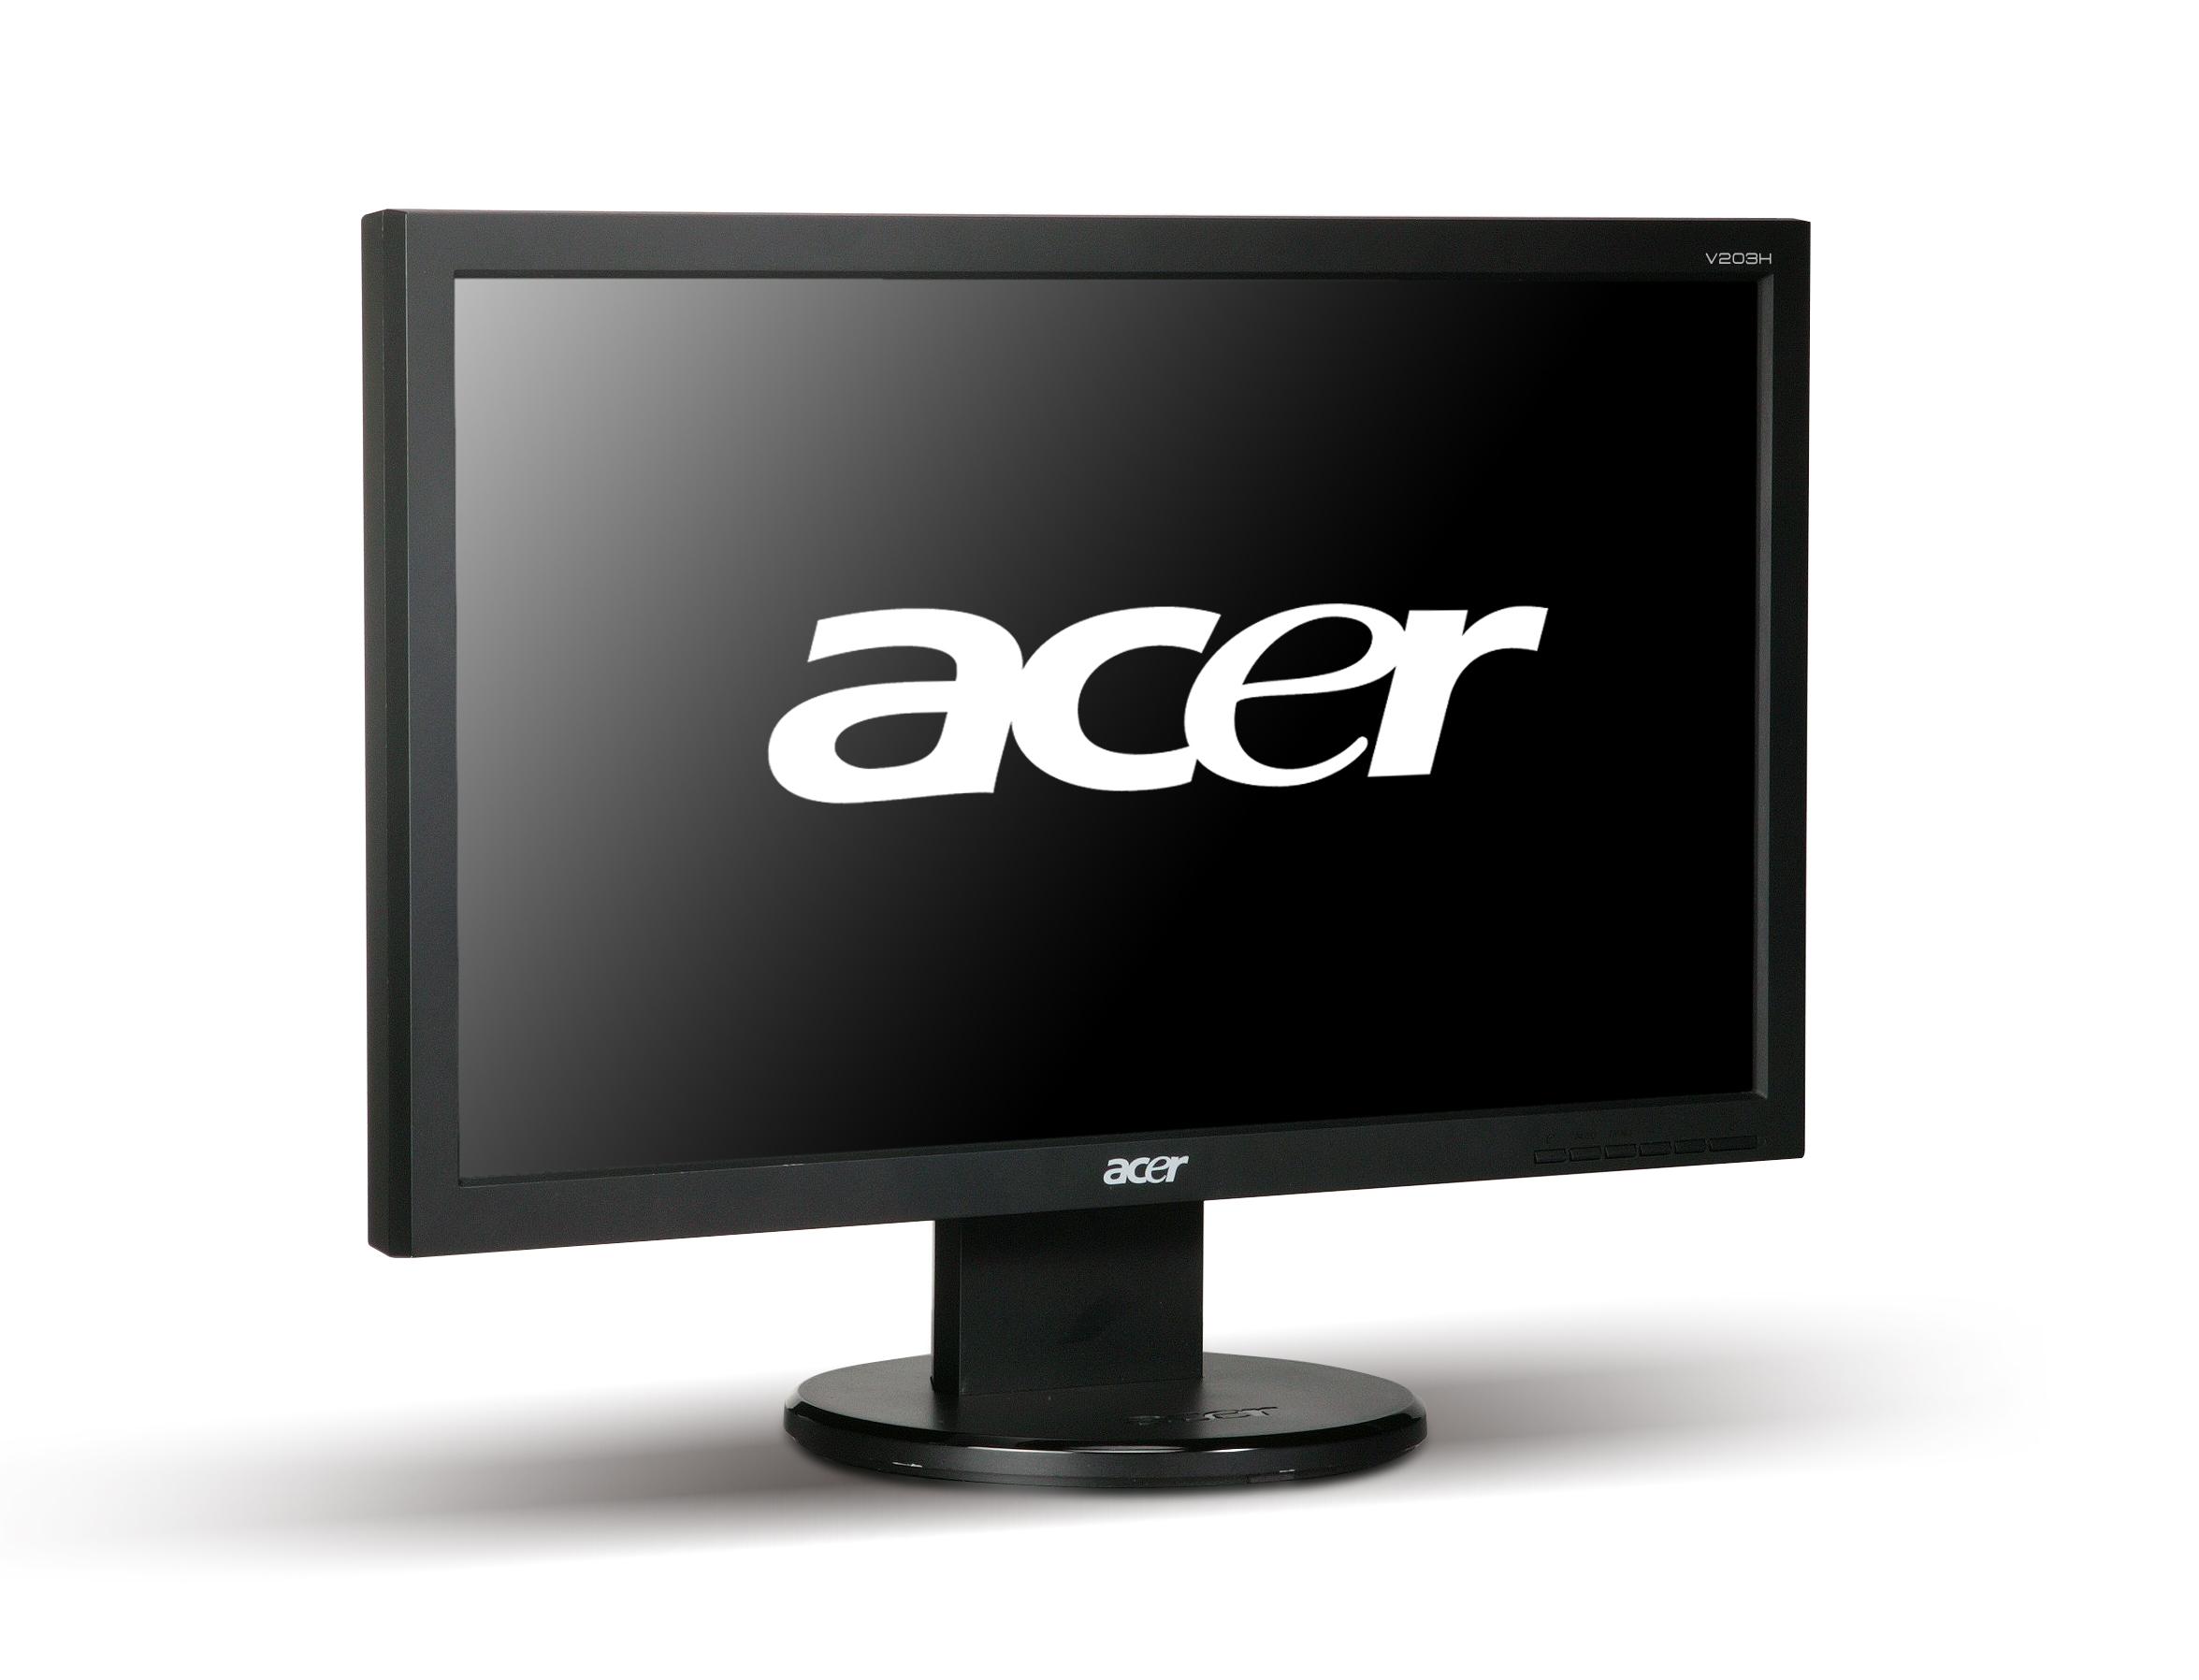 Acer20吋液晶螢幕2拷貝.jpg